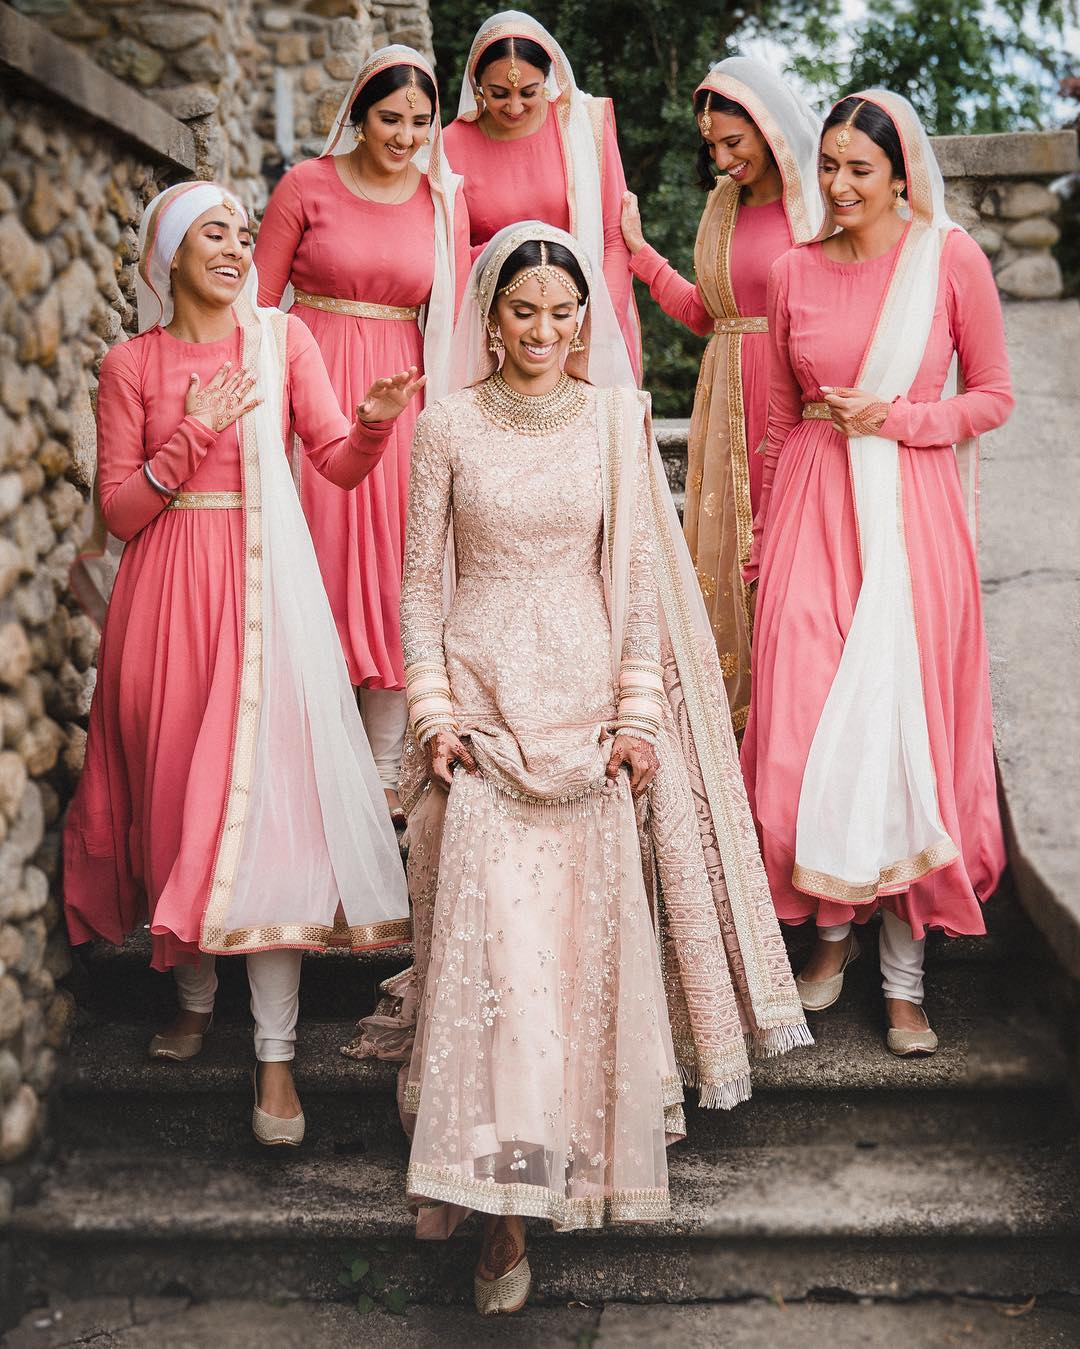 bride and bridesmaid wearing pink